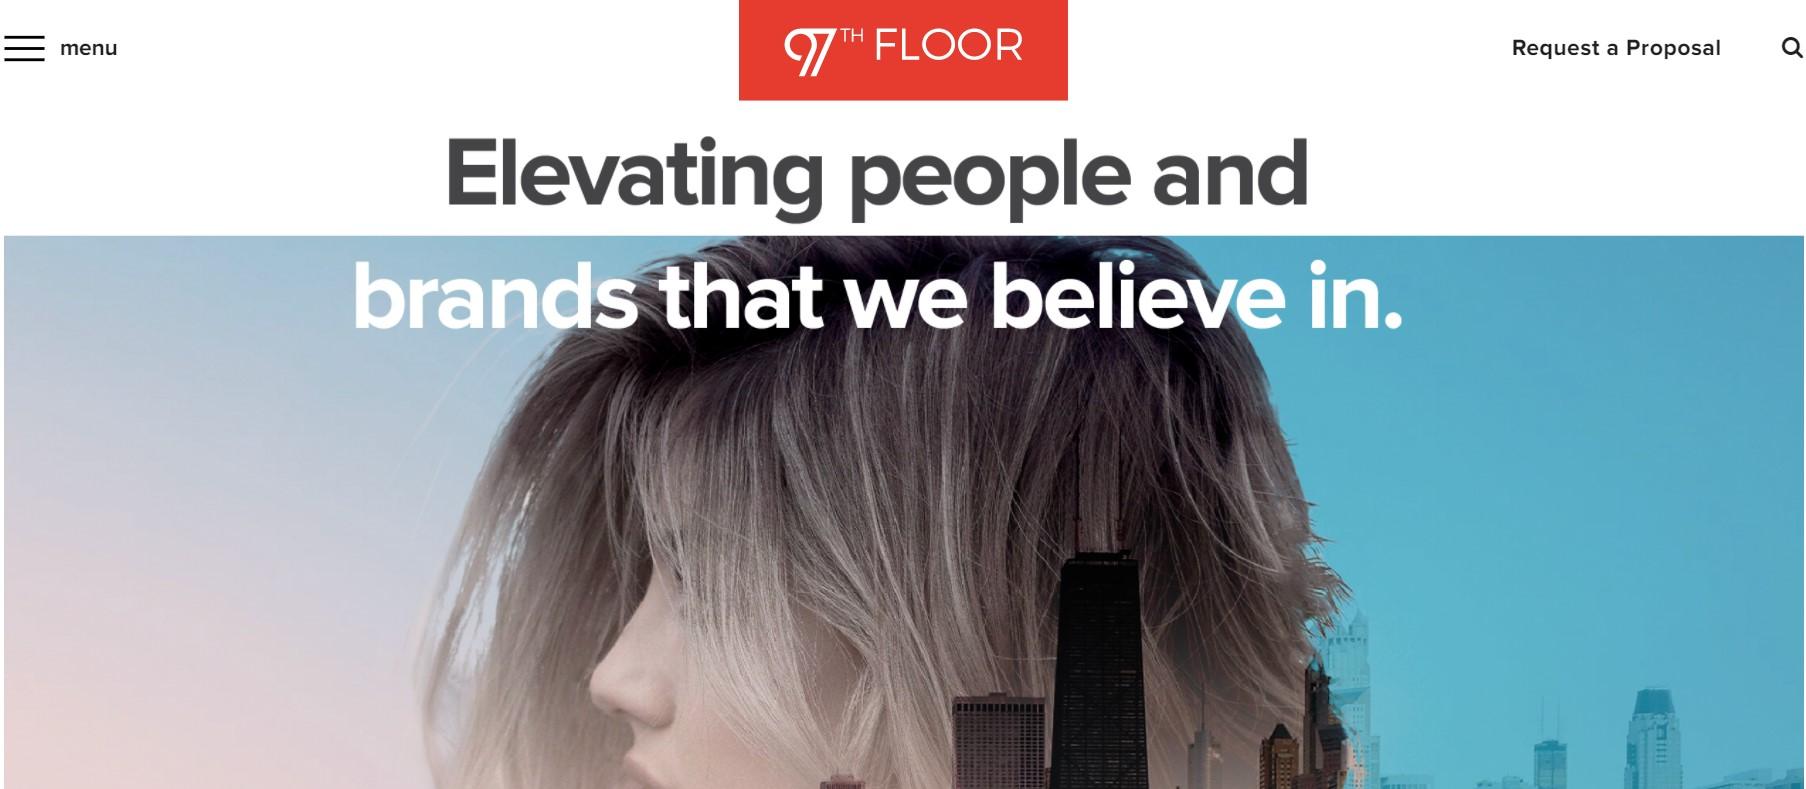 97th-floor-top-digital-marketing-agencies